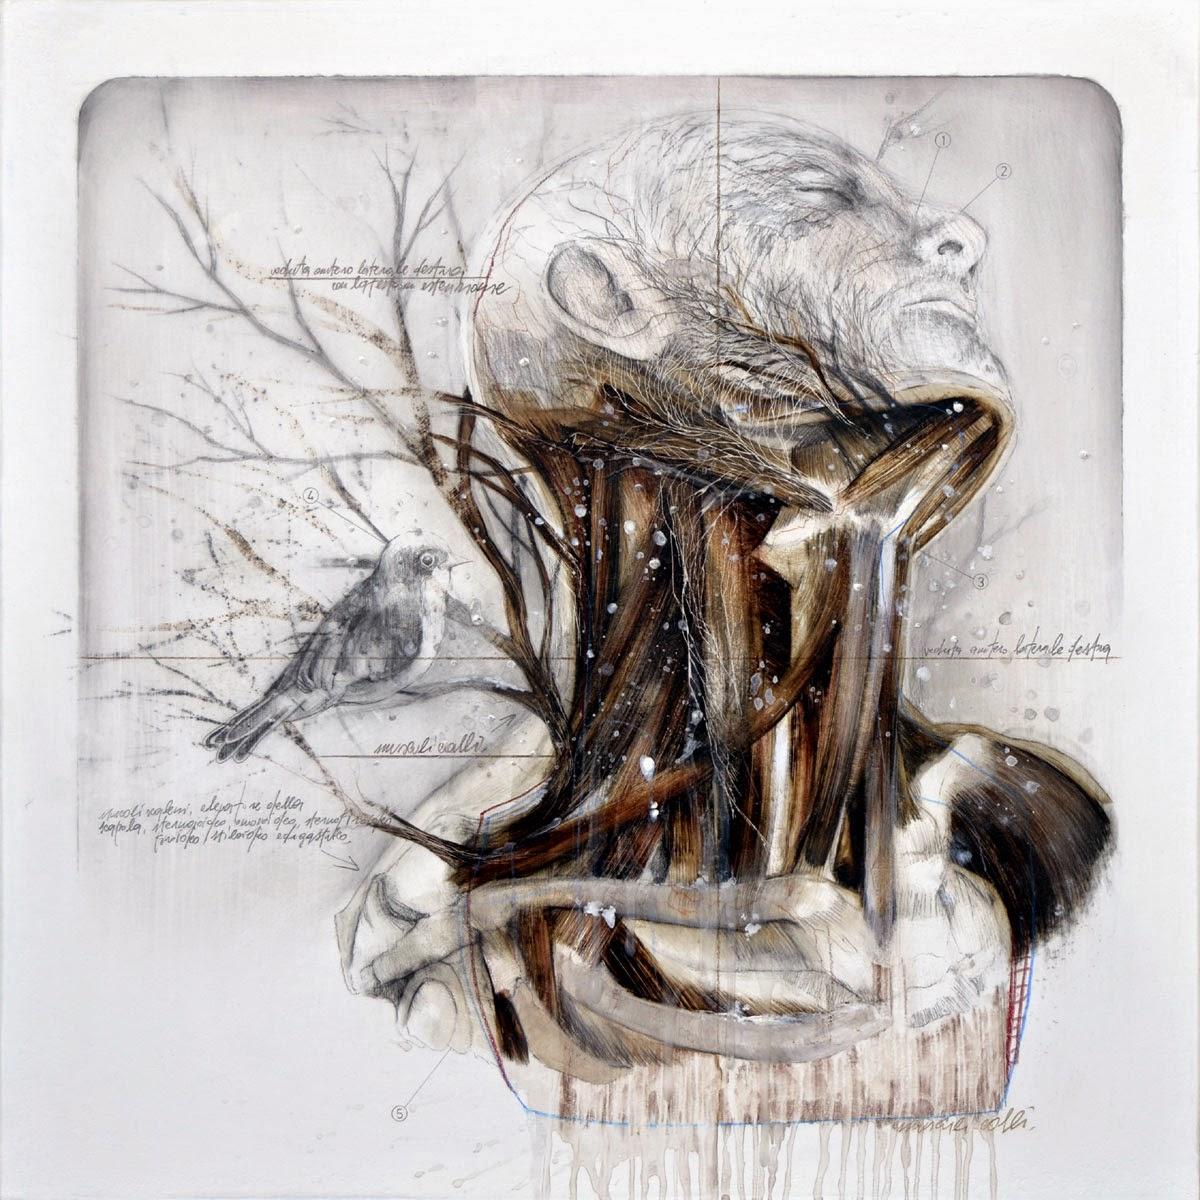 nunzio-paci-human-illustration 4